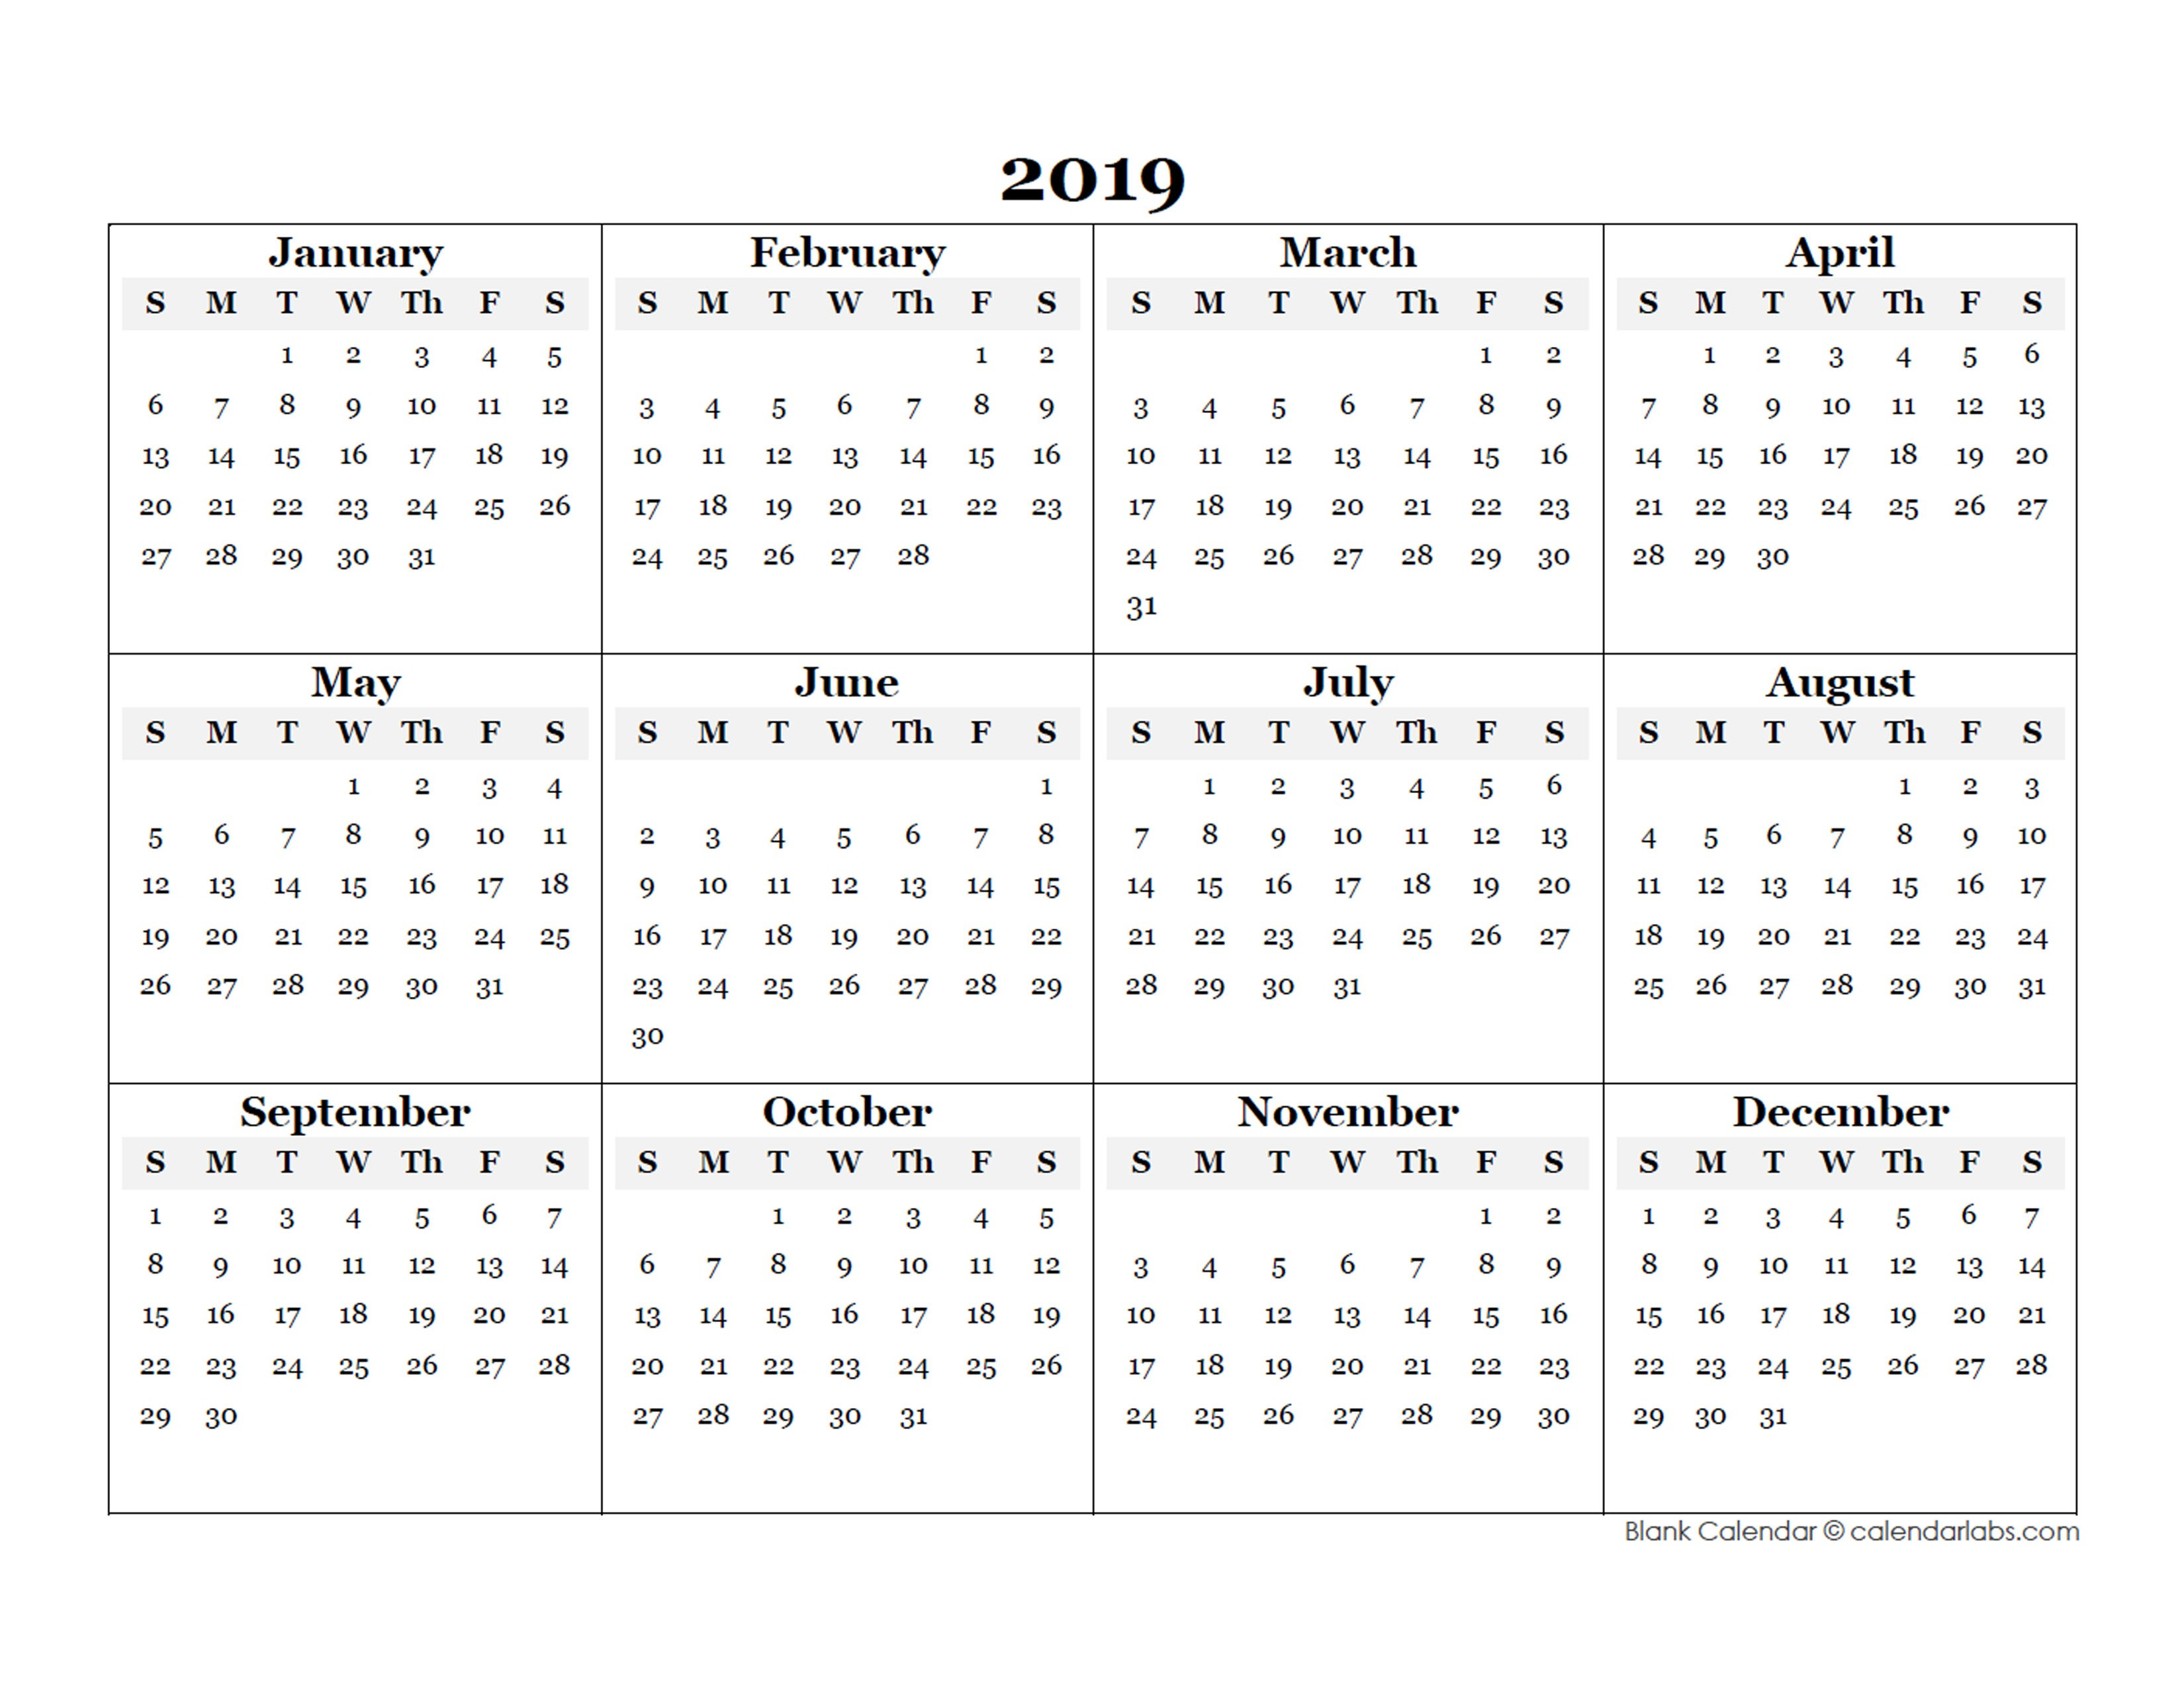 Free Printable Calendar Templates 2019 2019 Blank Yearly Calendar Template Free Printable Templates